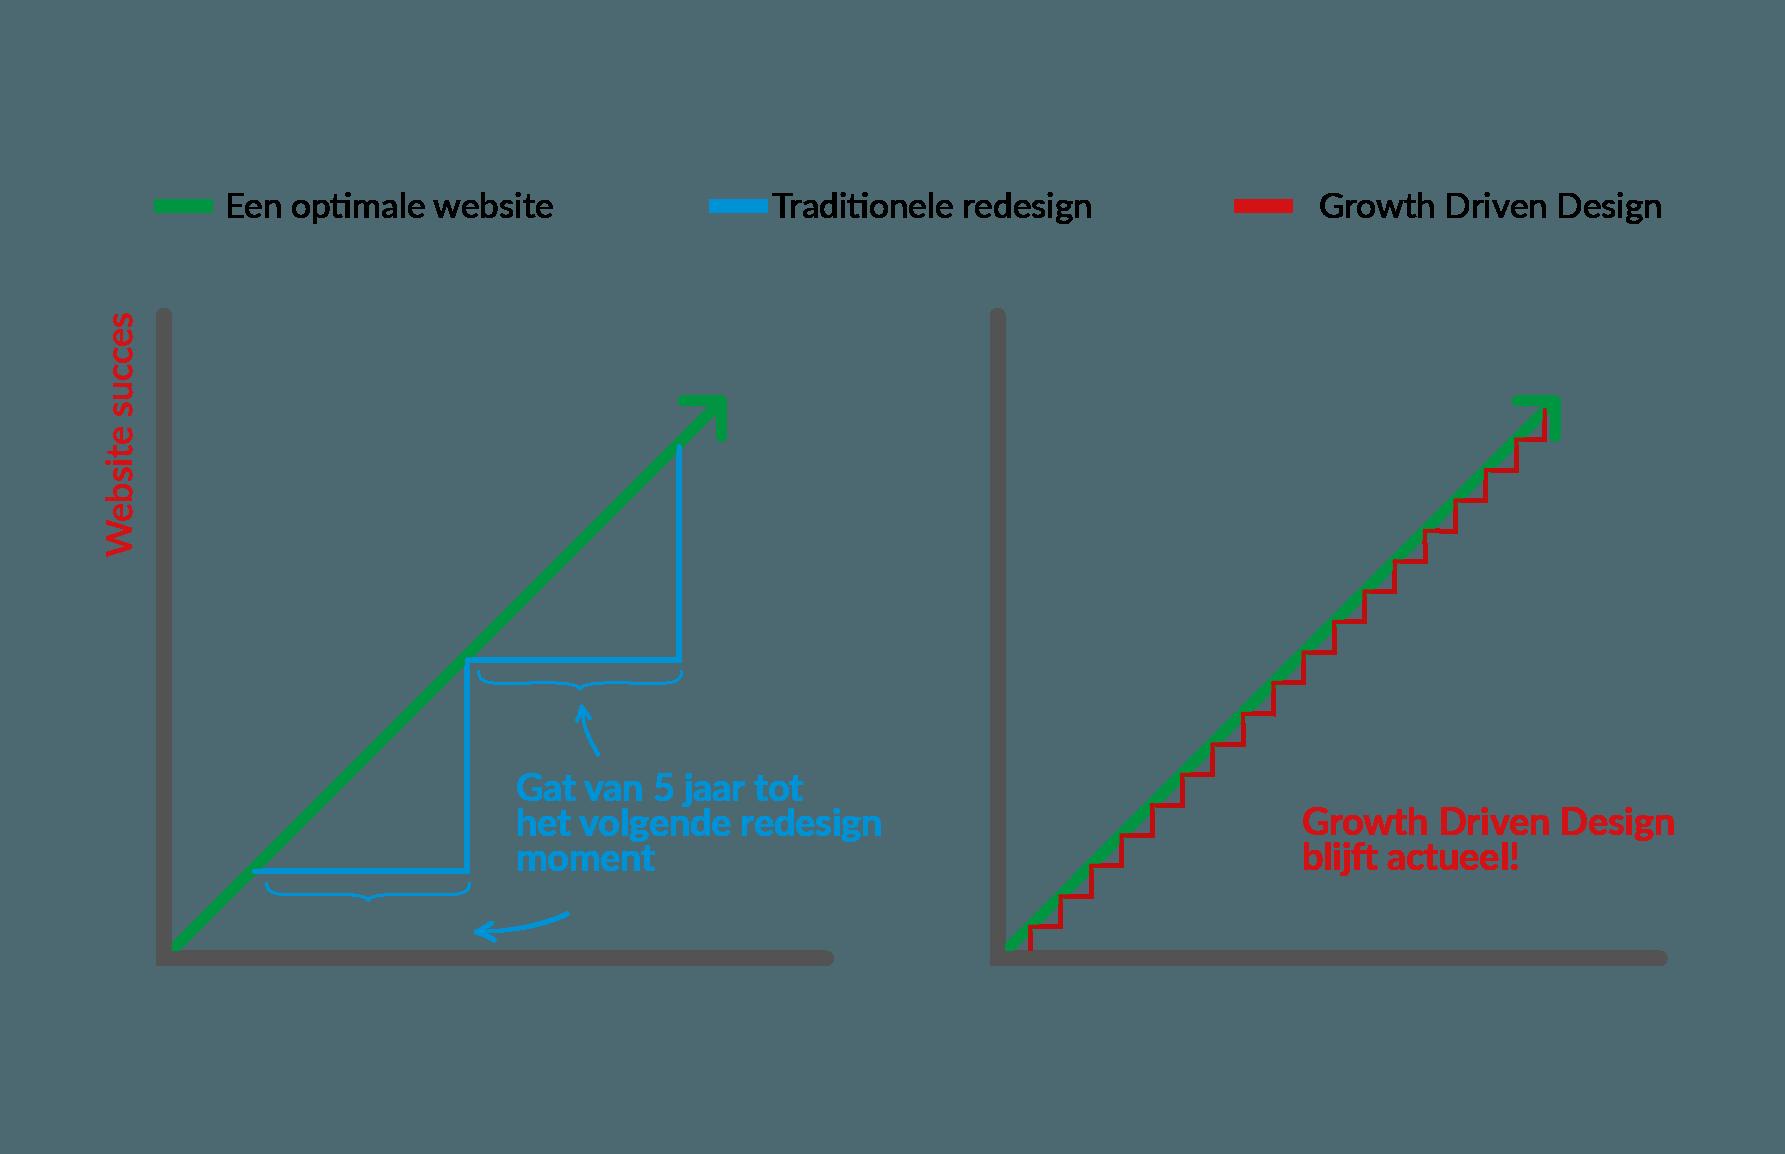 bureauvet-online-marketing-gdd-growthdrivendesign-Website-succes-nieuw